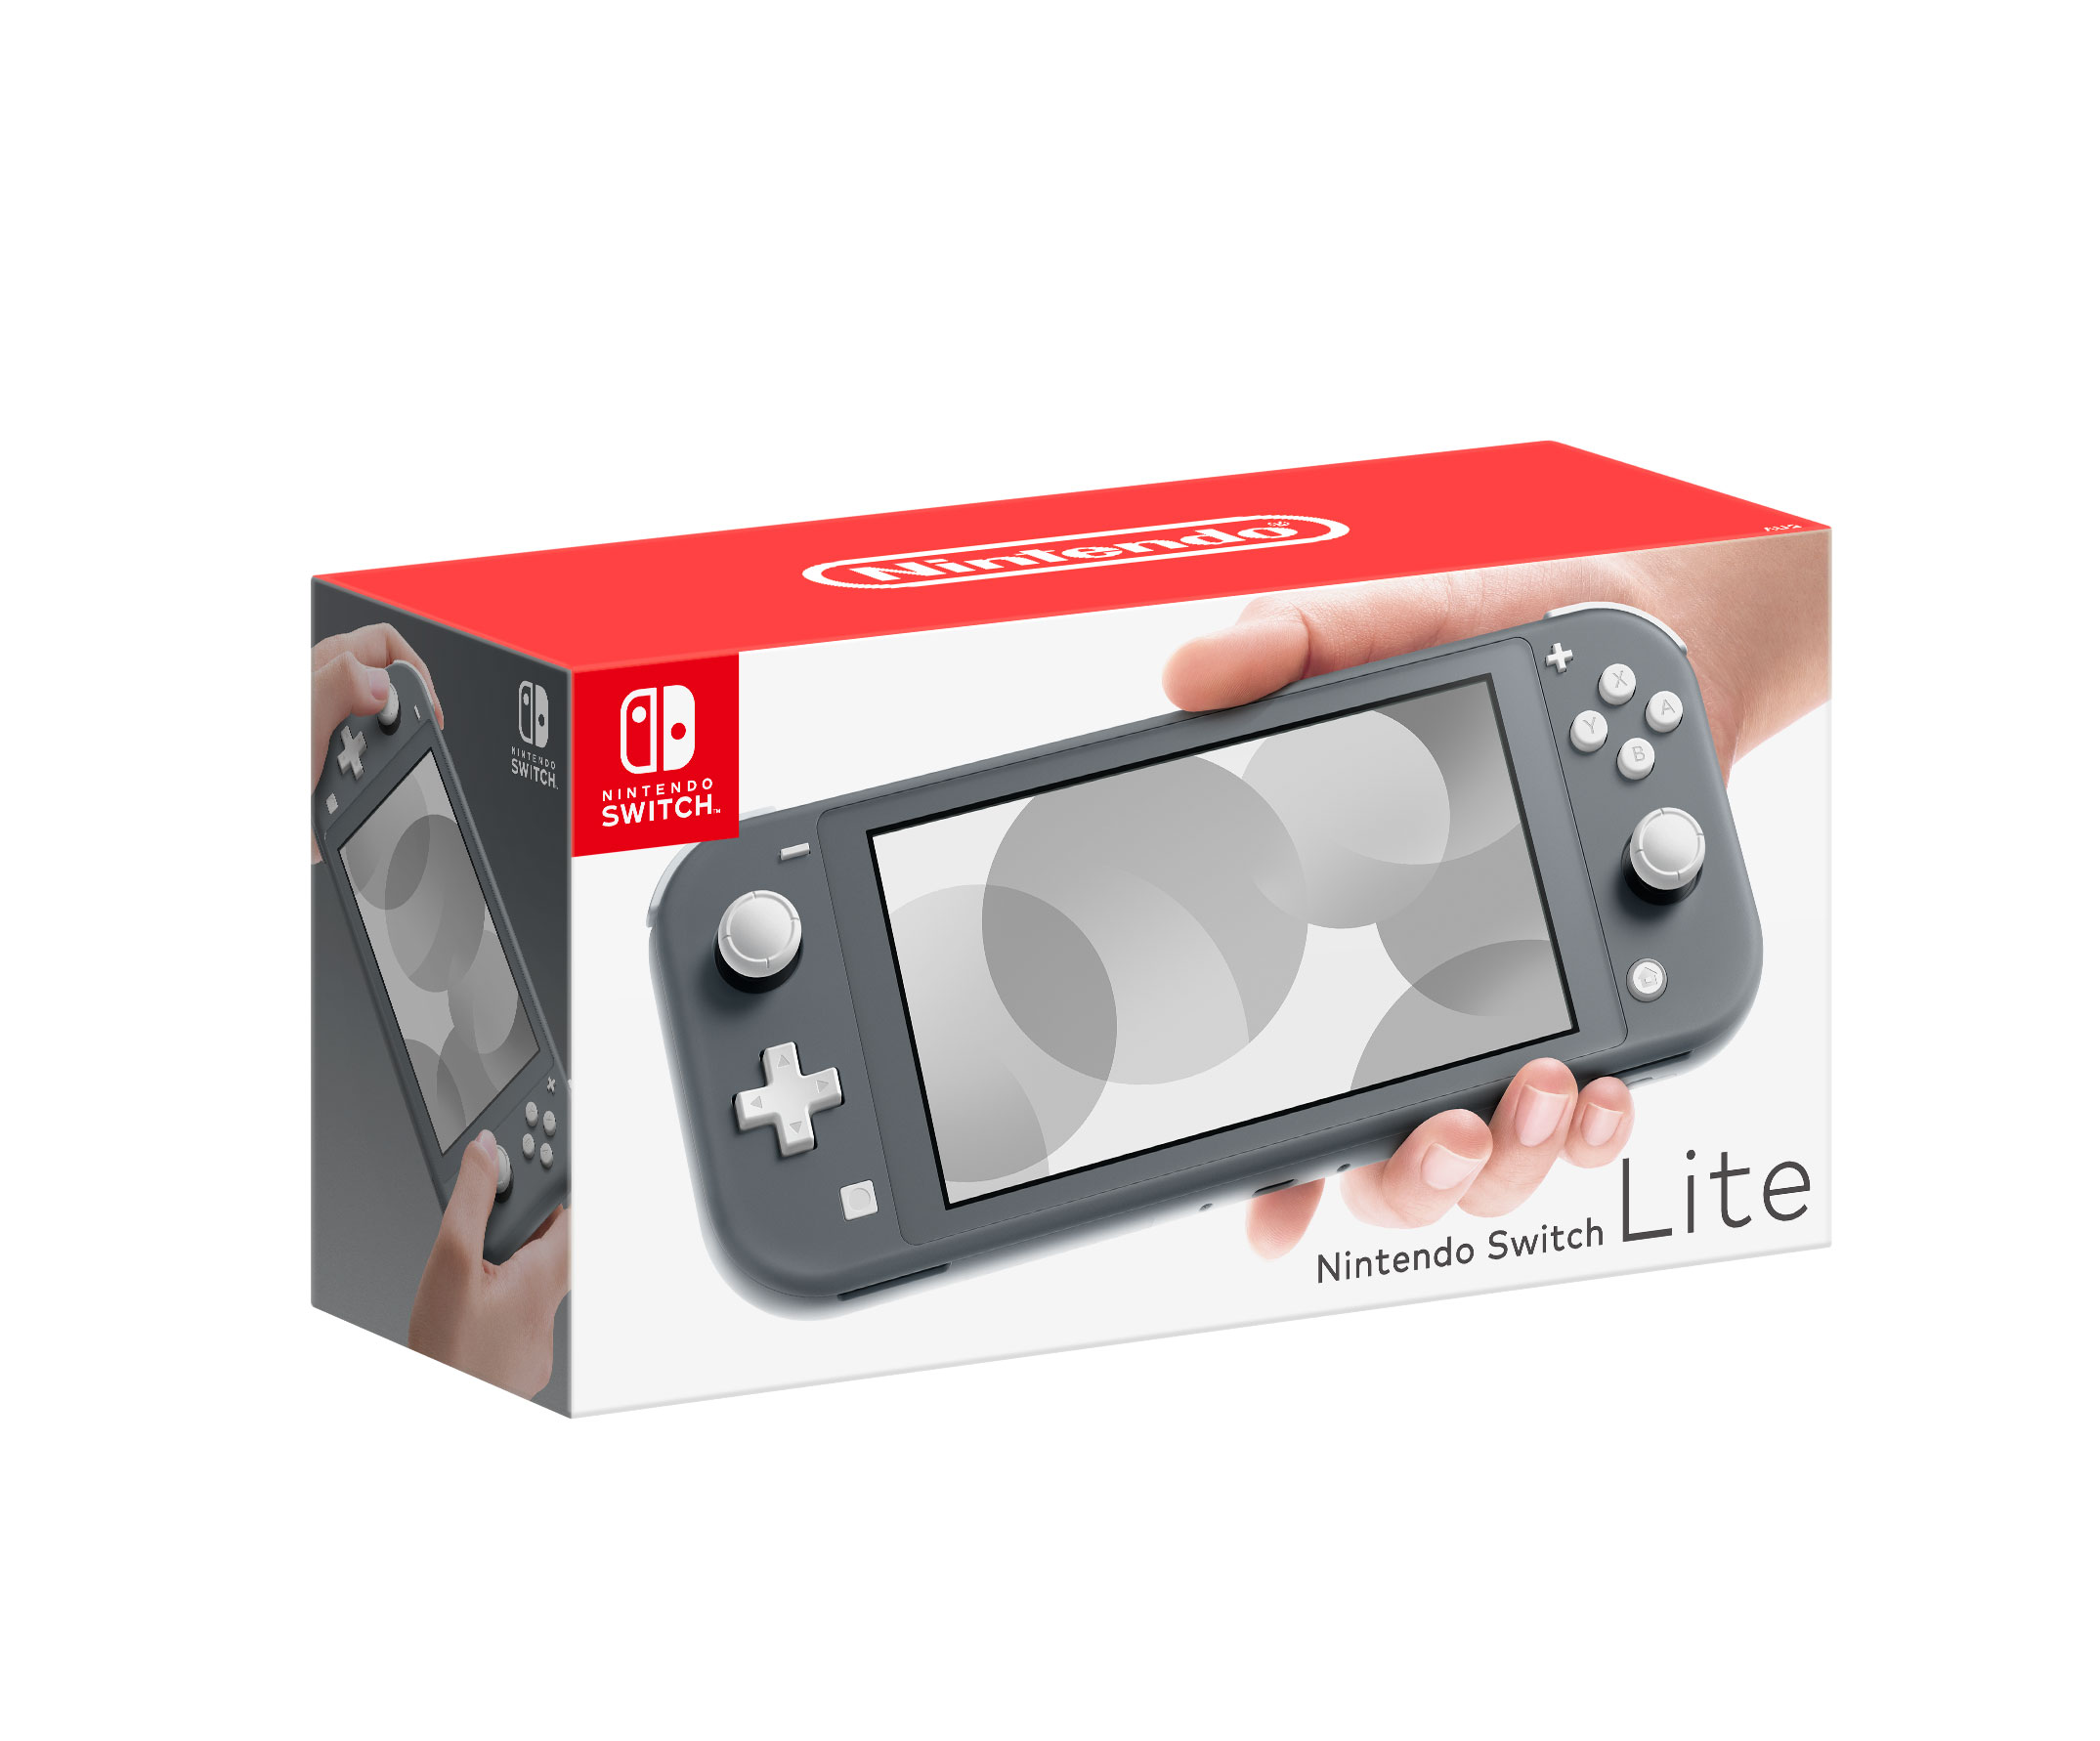 Nintendo Switch Lite - Grey Packshot (1).jpg